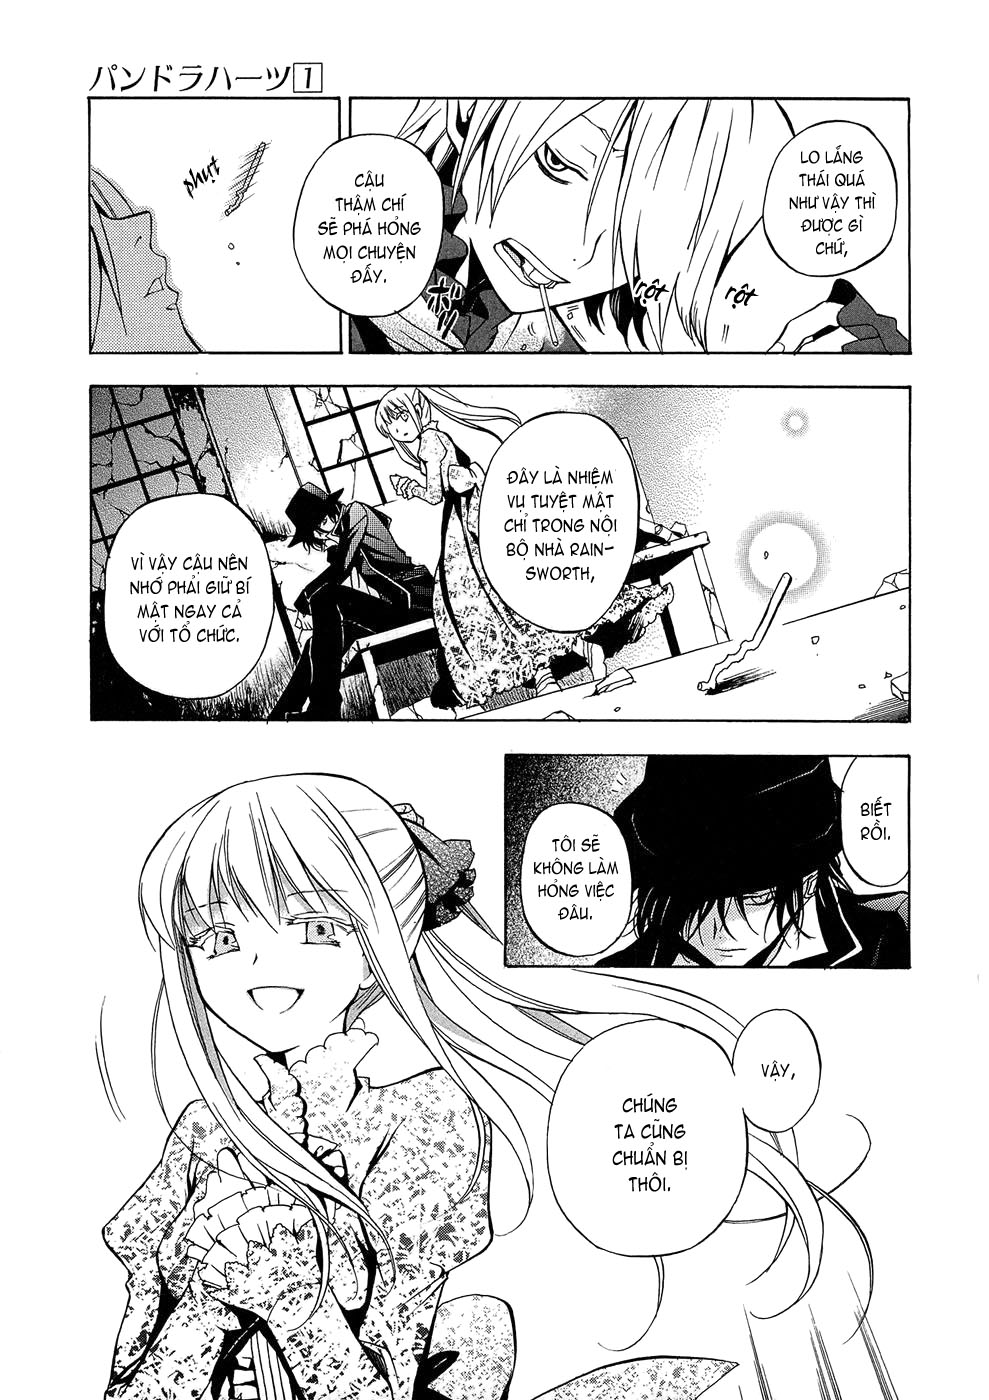 Pandora Hearts chương 003 - retrace: iii prisoner & alichino trang 4